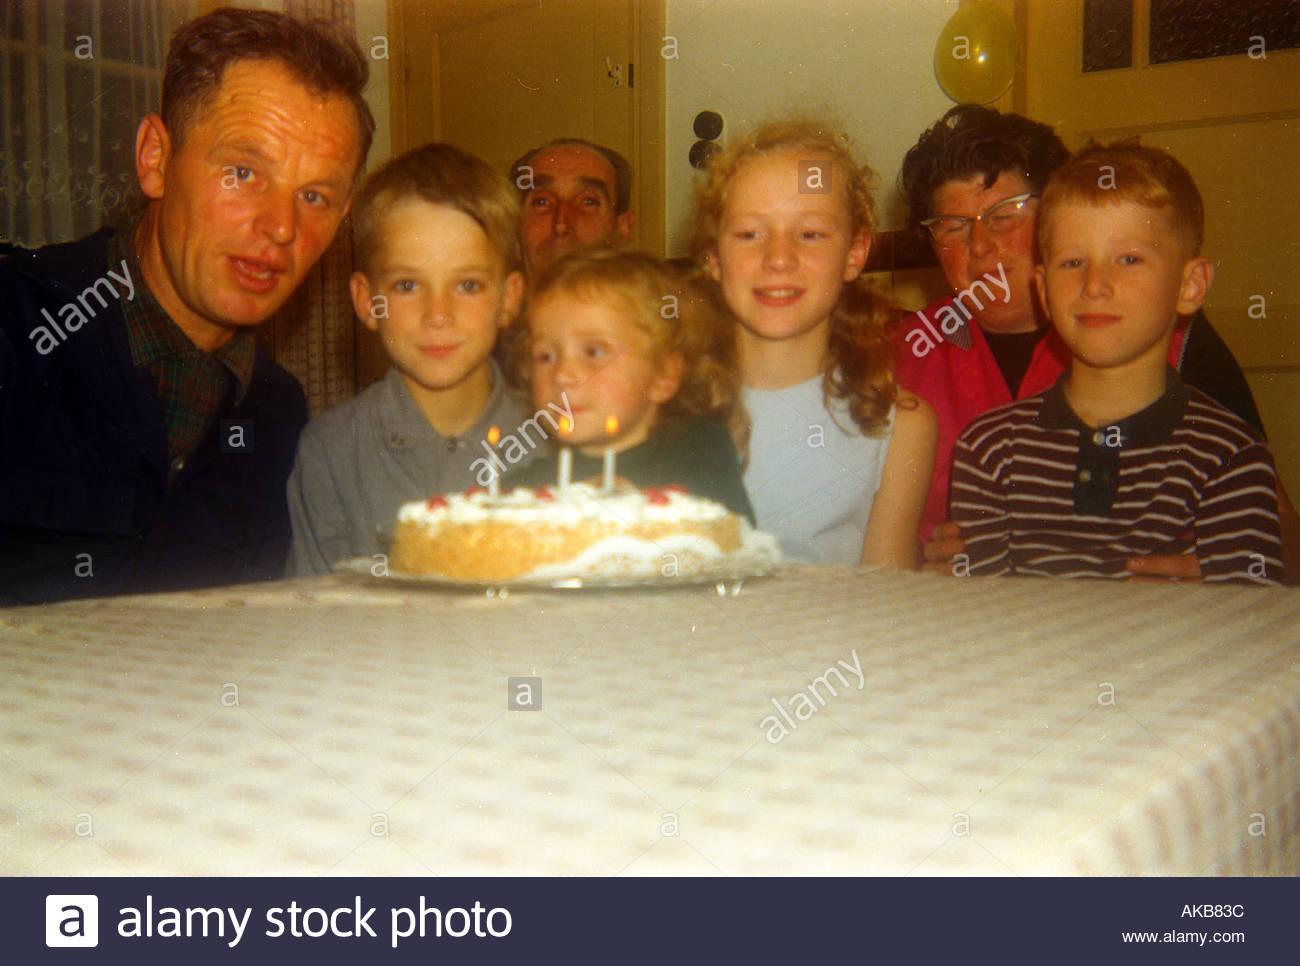 Family celebration of third birthday - Stock Image